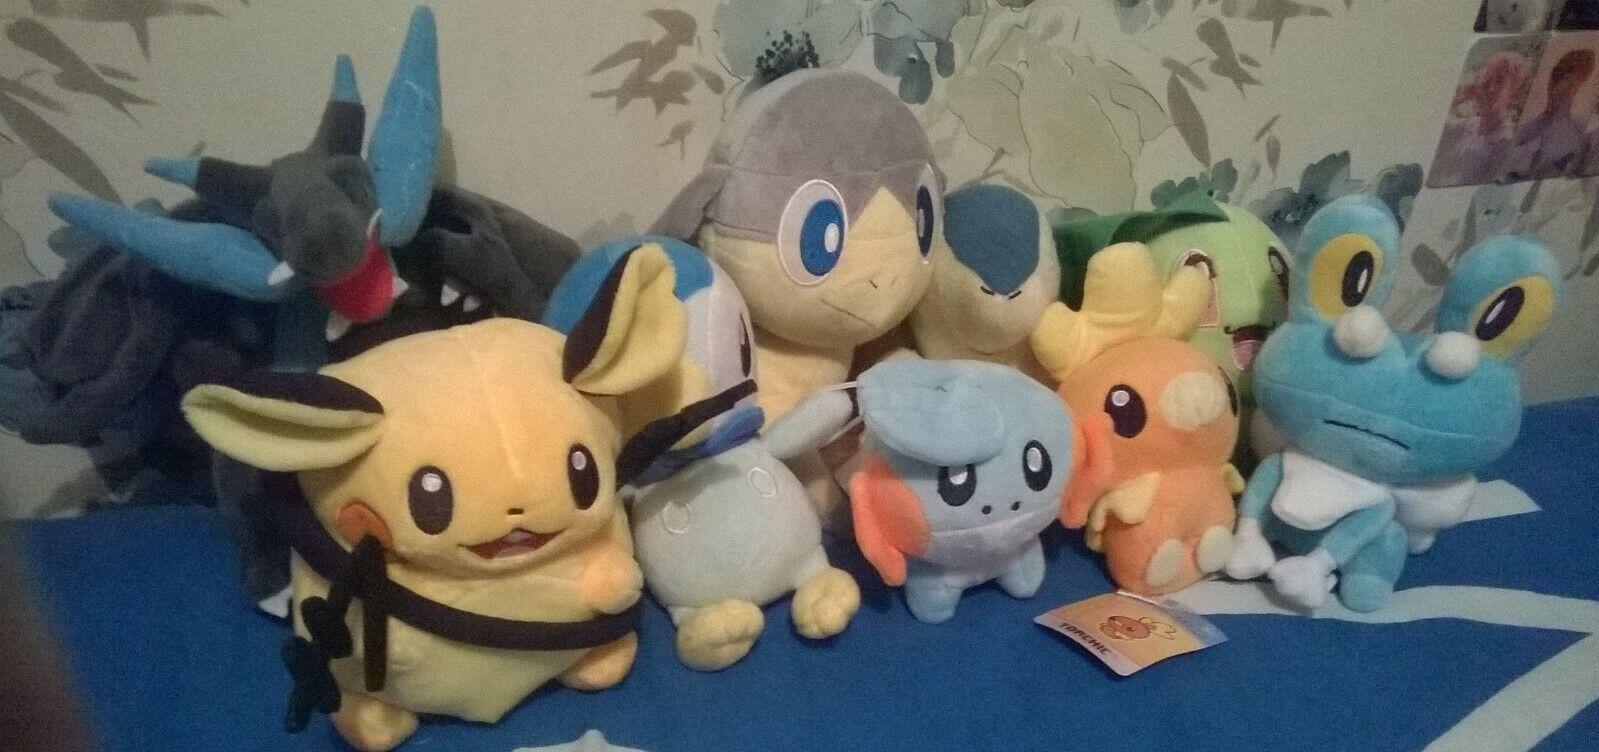 Large Pokemon Stuffed Toy Bundle x9 ( assortSiet will name in description)